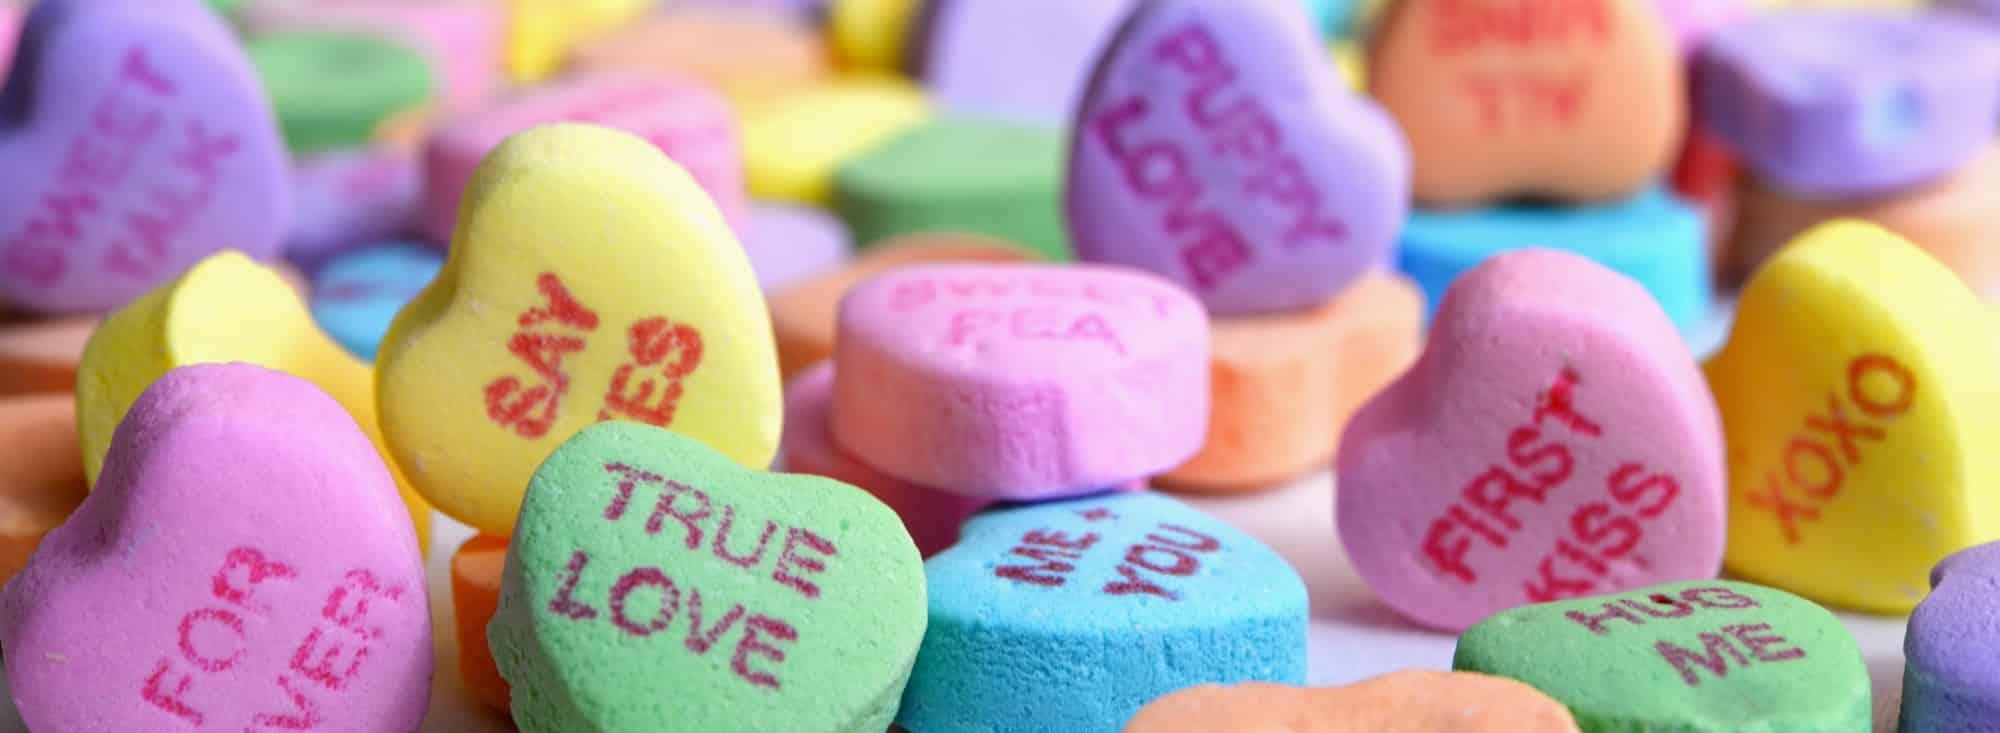 Using retail copywriting to build brand loyalty